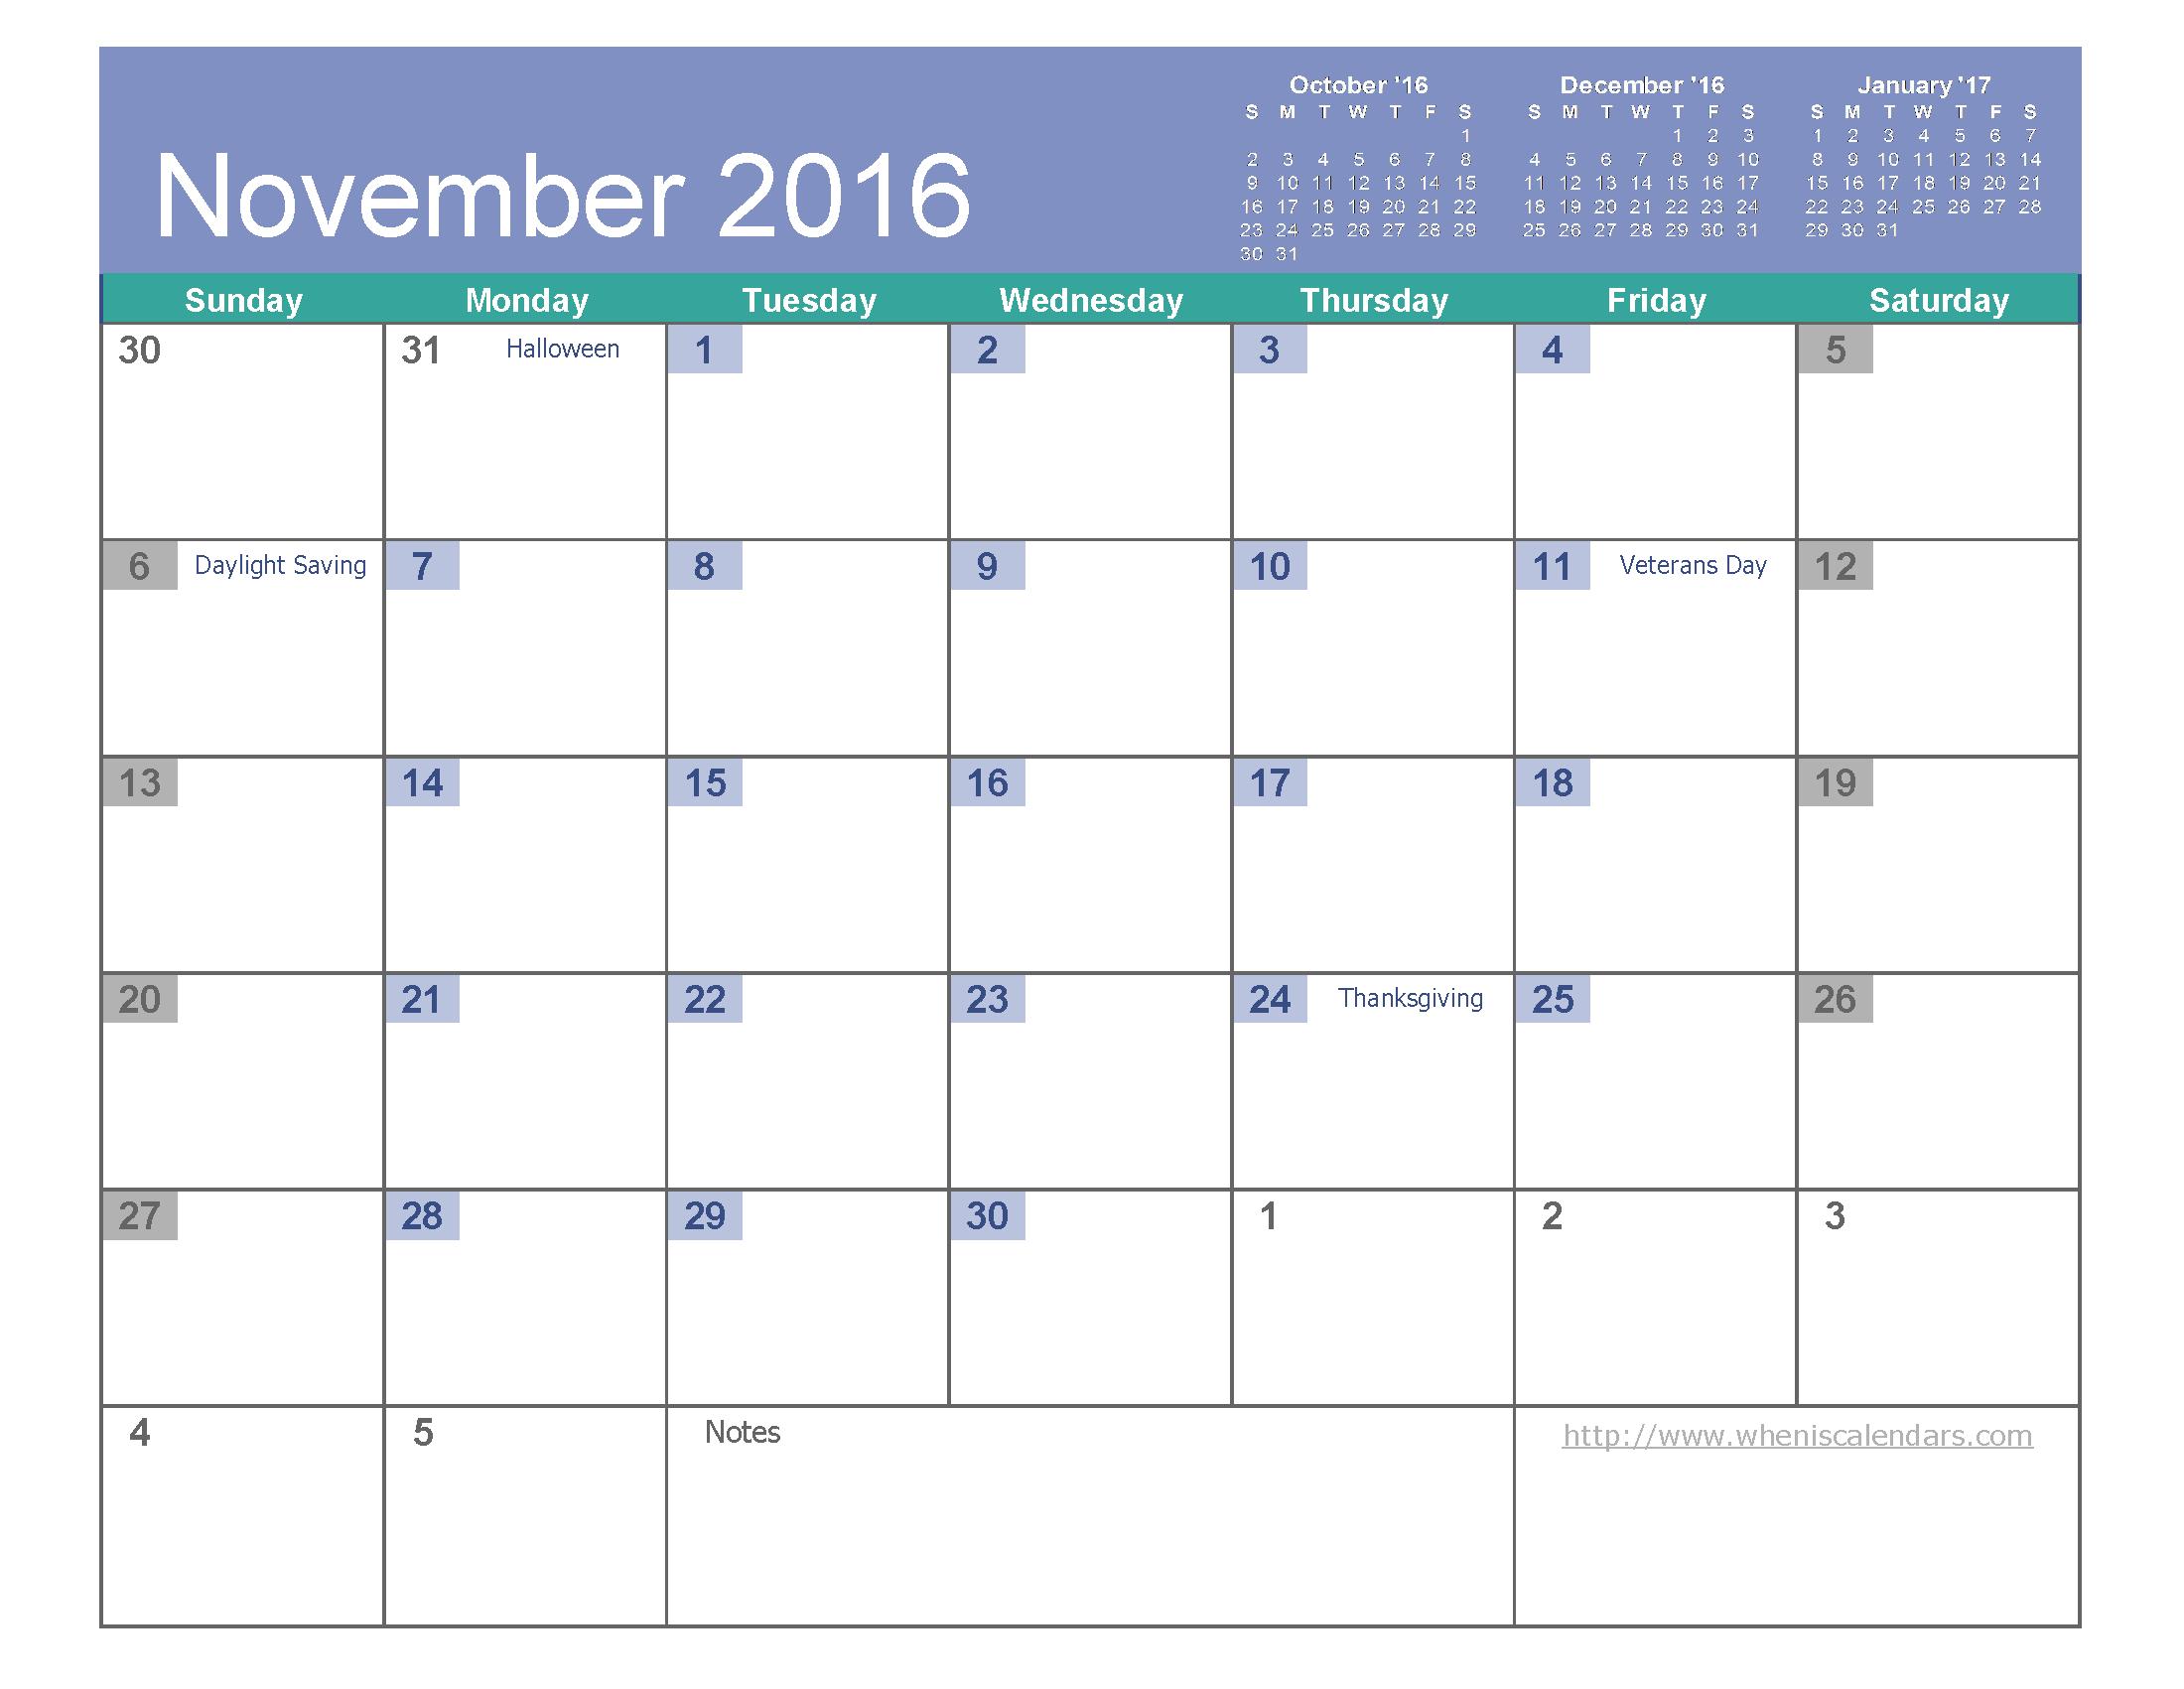 Calendar clipart november 2016 jpg transparent library March 2017 Calendar Clipart jpg transparent library